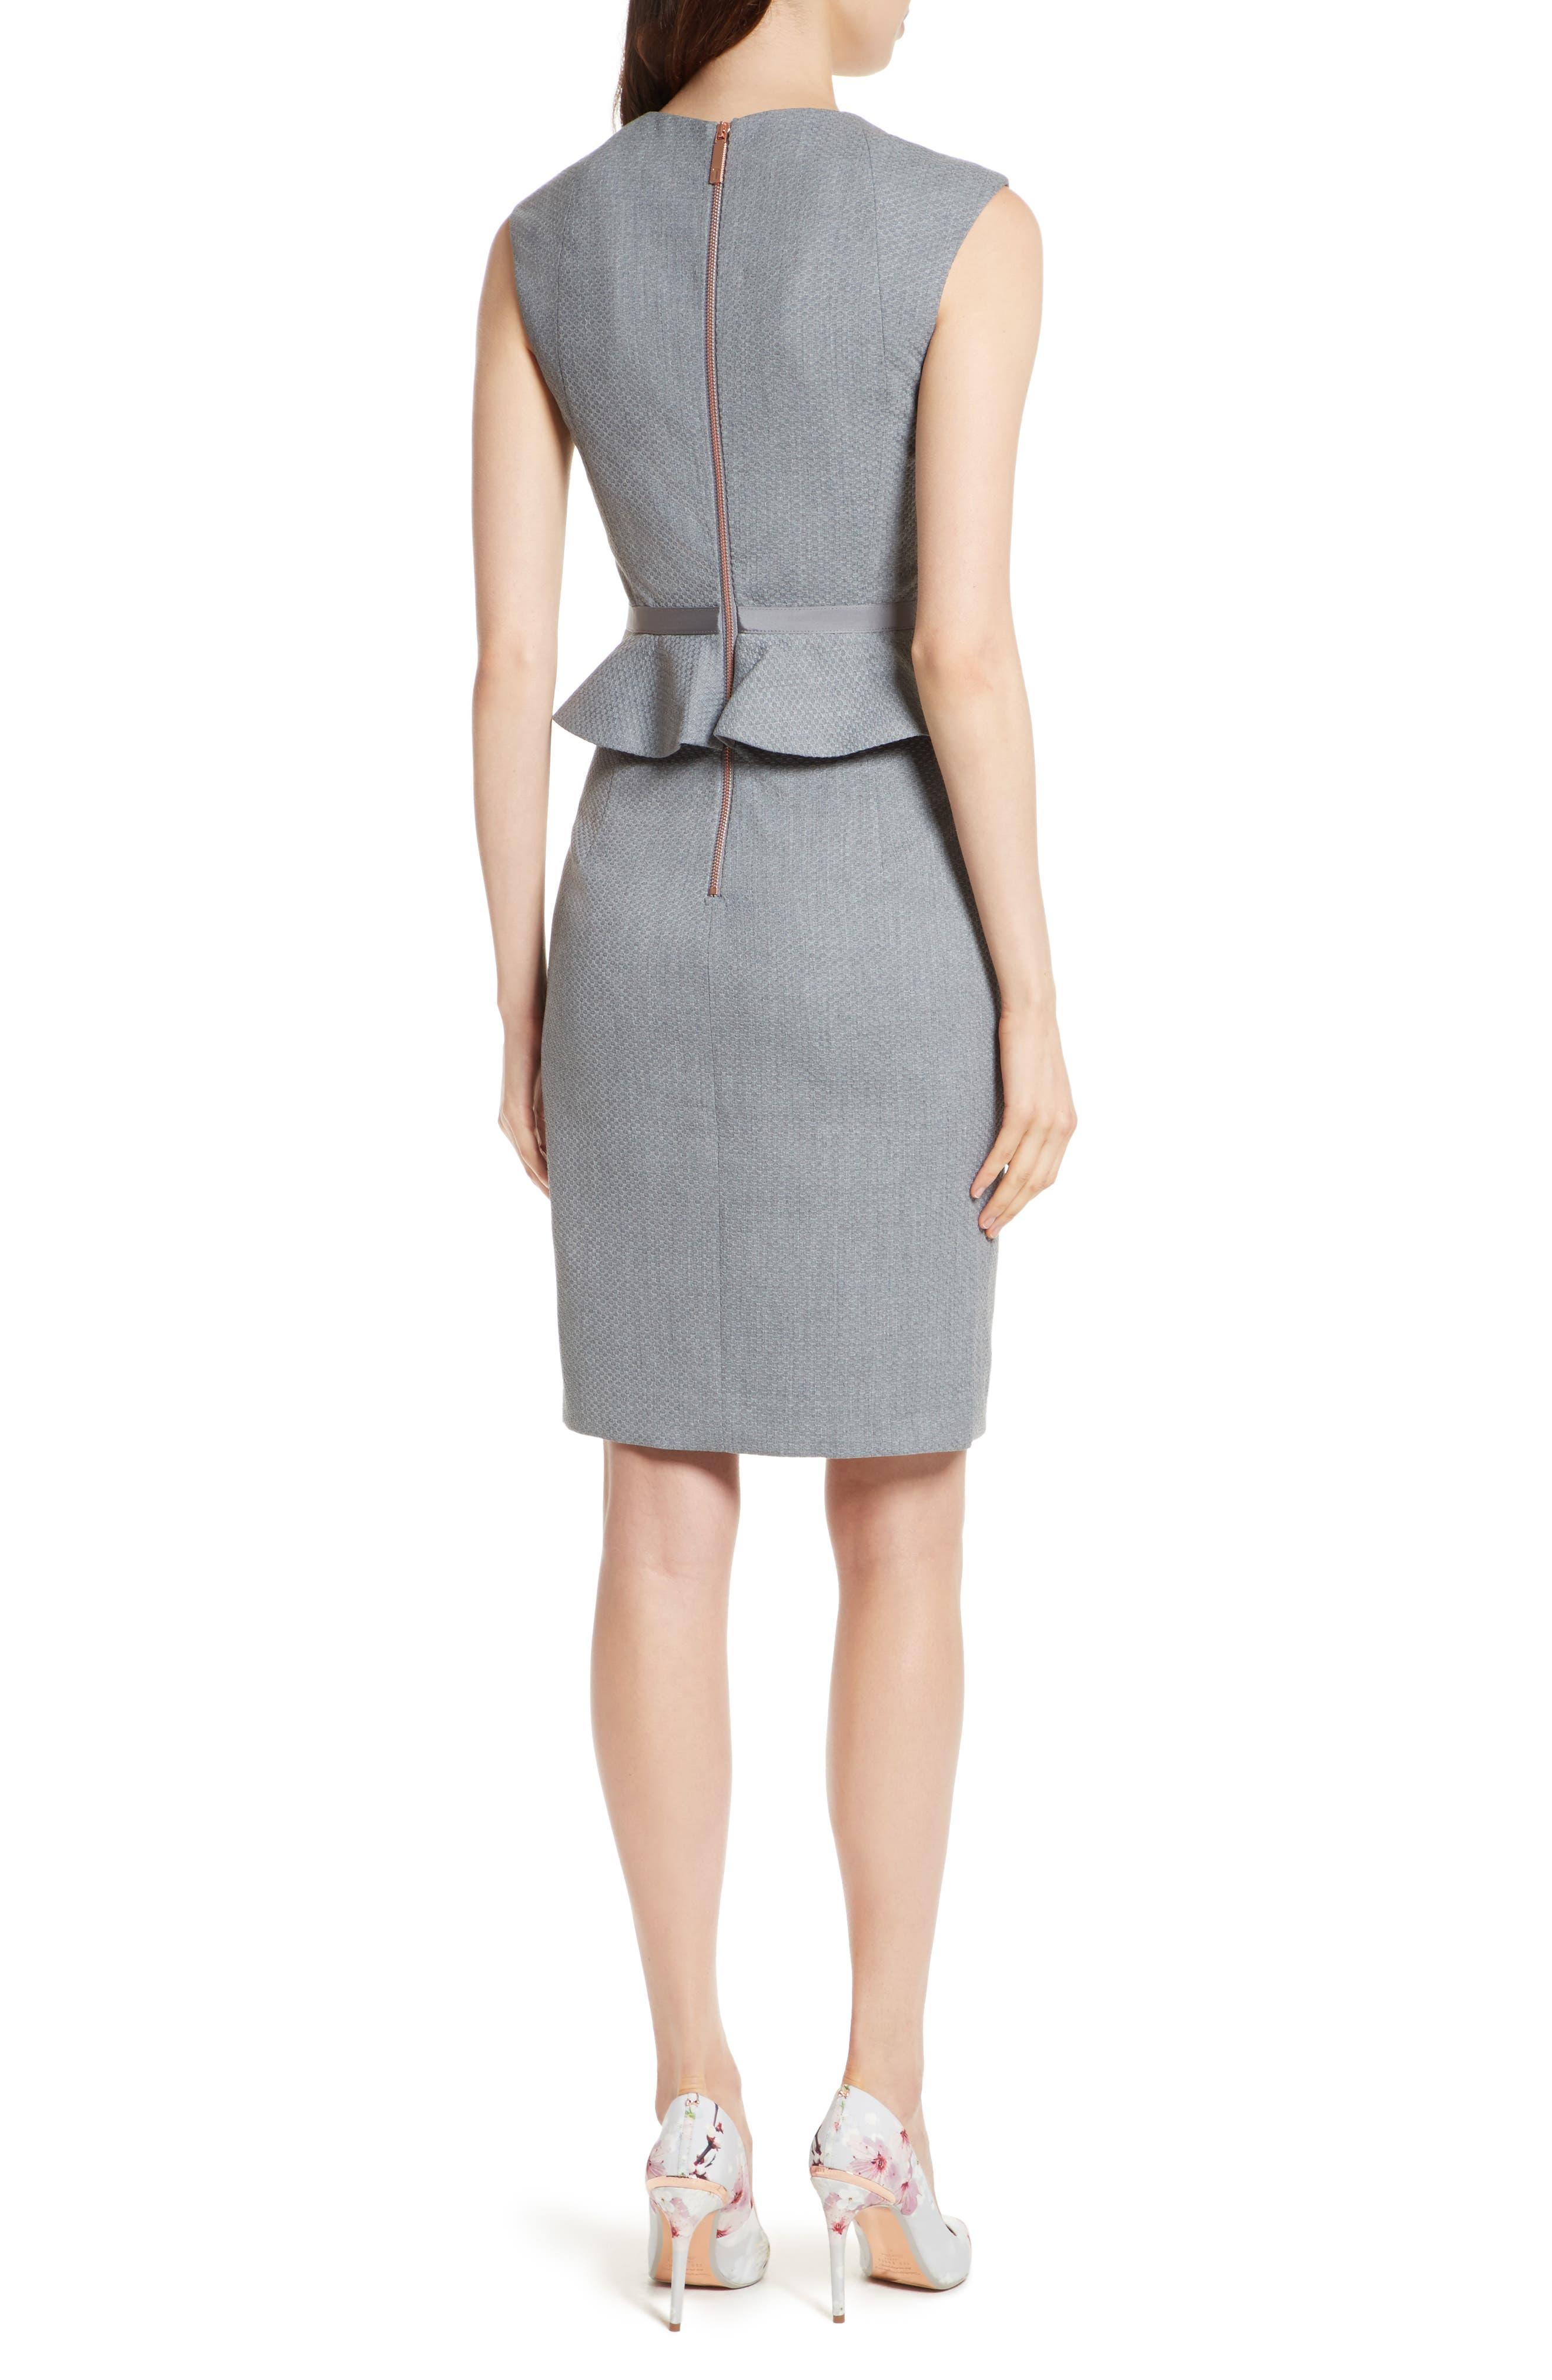 Nadaed Bow Detail Textured Peplum Dress,                             Alternate thumbnail 2, color,                             Mid Grey